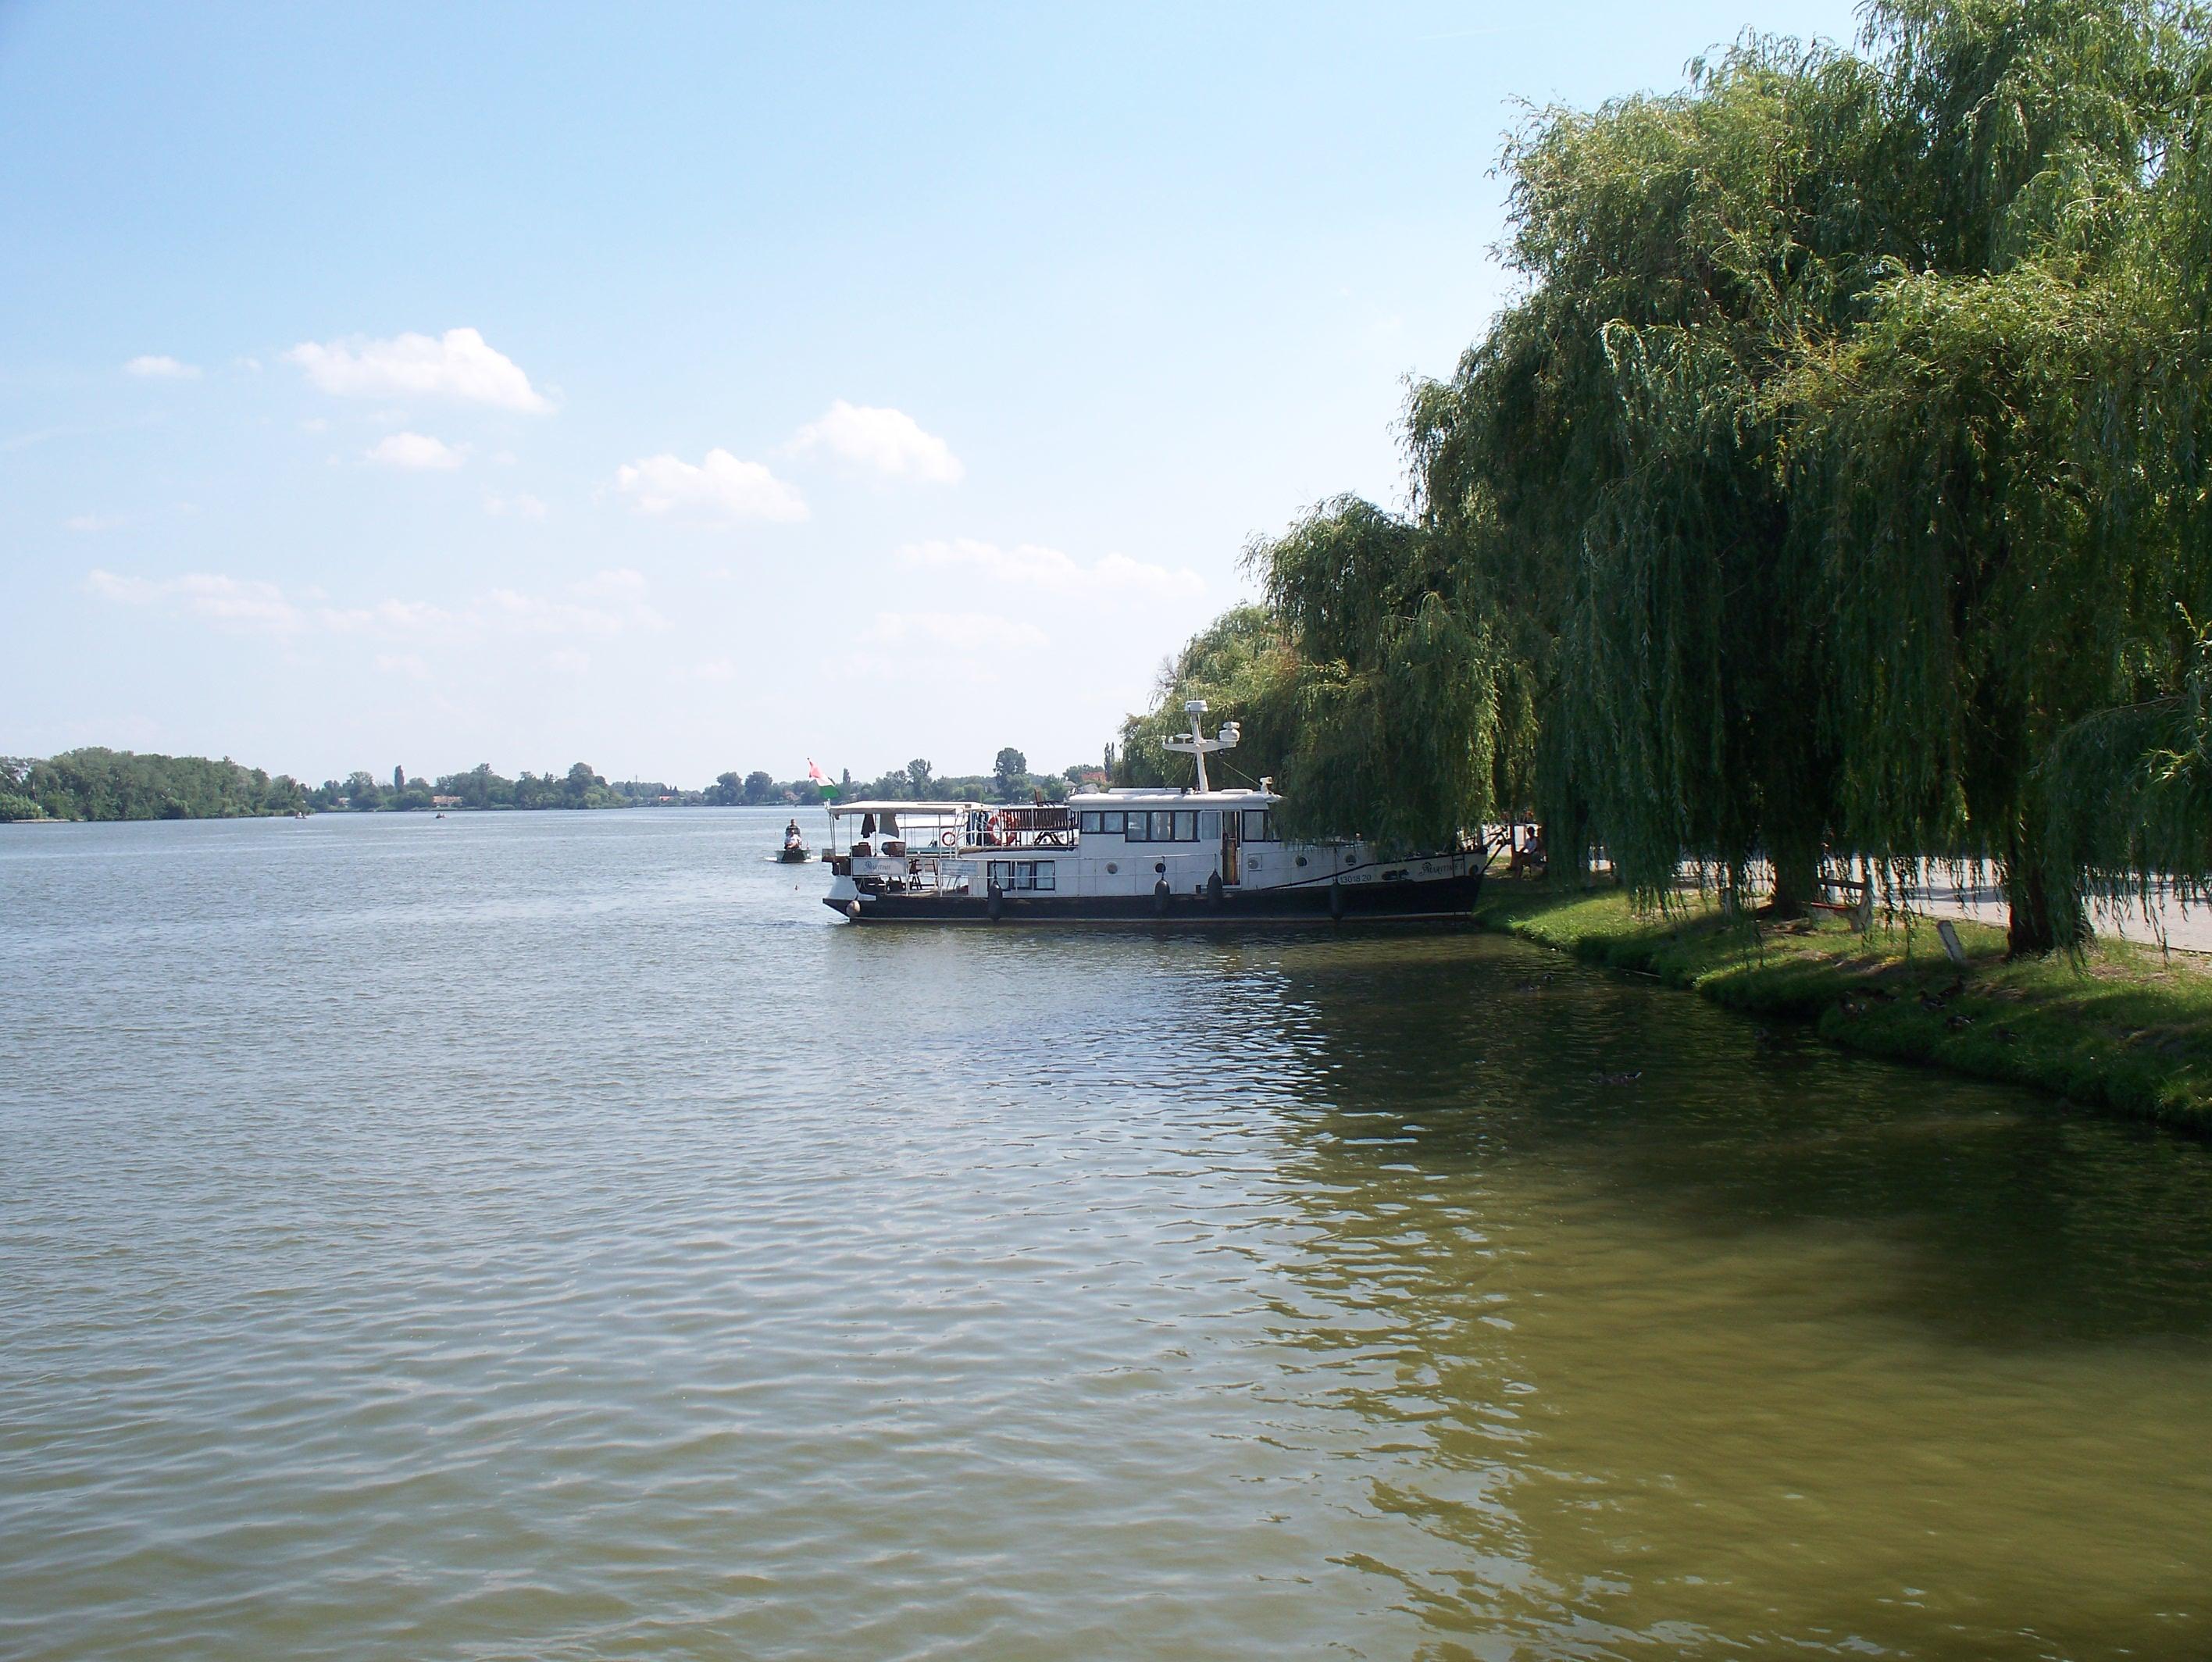 http://www.kisdunainagyhajok.hu/egyebhajok/2012_06_24_maritime_motoros_vonatohajo_a_rackevei_piacnal/2012_06_24_maritime_motoros_vonatohajo_a_rackevei_piacnal_012.jpg